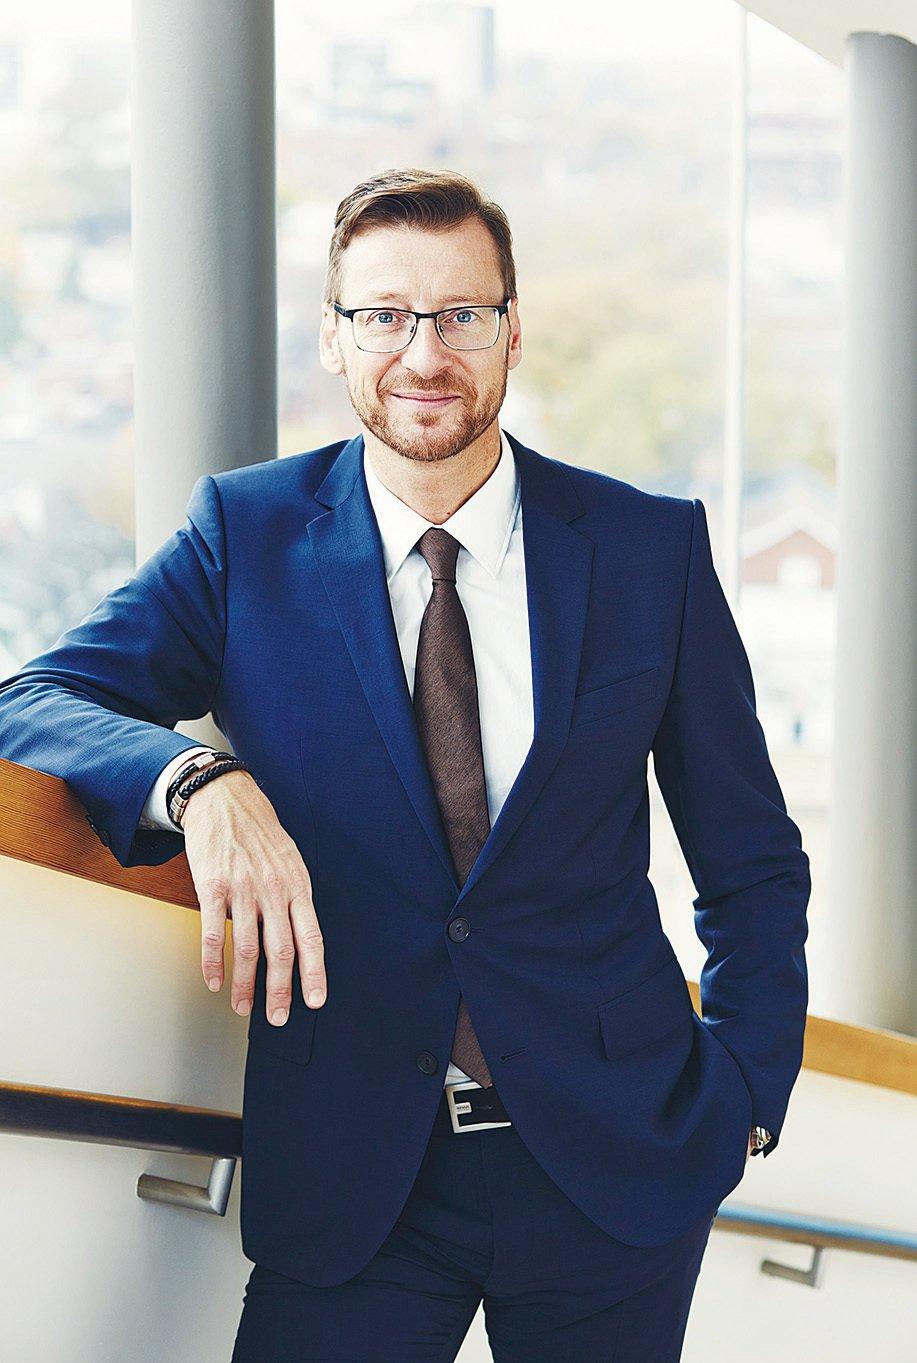 Wolfgang Hoffmann主要負責開發經銷商網絡,維護Jaguar Land Rover品牌形象,打造全球汽車工程與設計頂級典範,並保持不斷為市場推出頂級汽車品牌設計的能力。(網絡圖片)